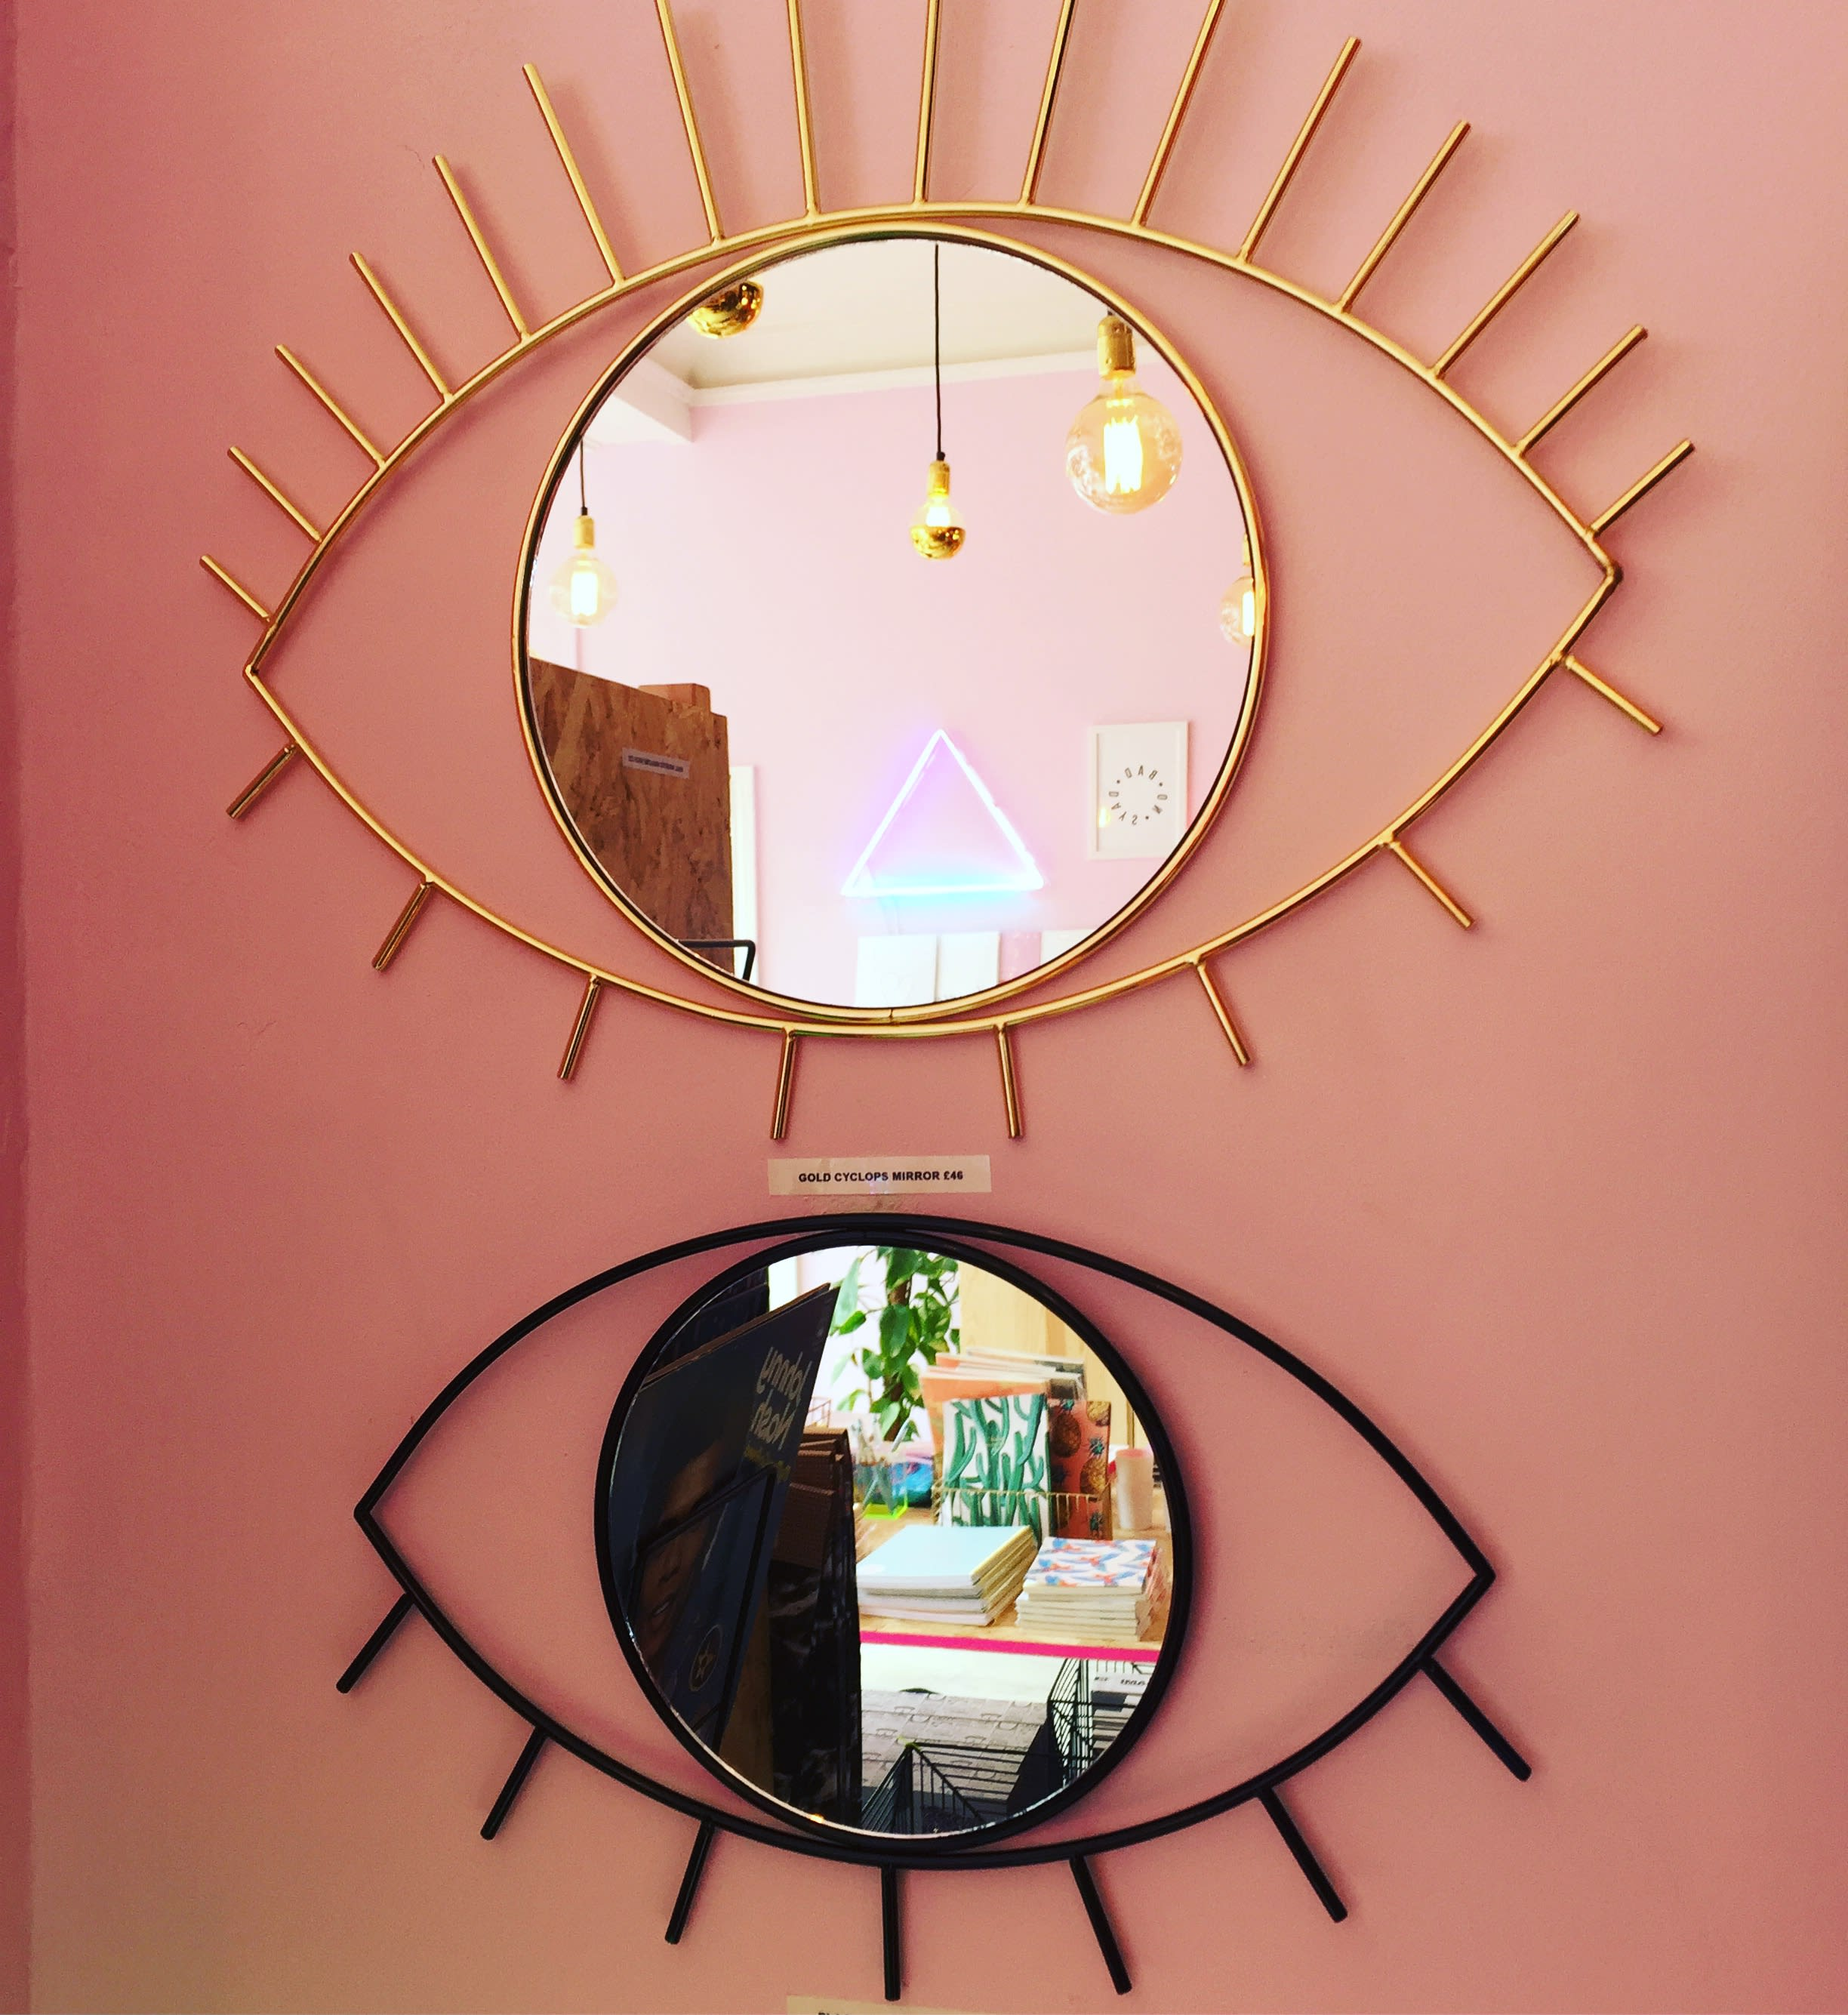 DOIY Design Black Cyclops Wall Mirror Medium